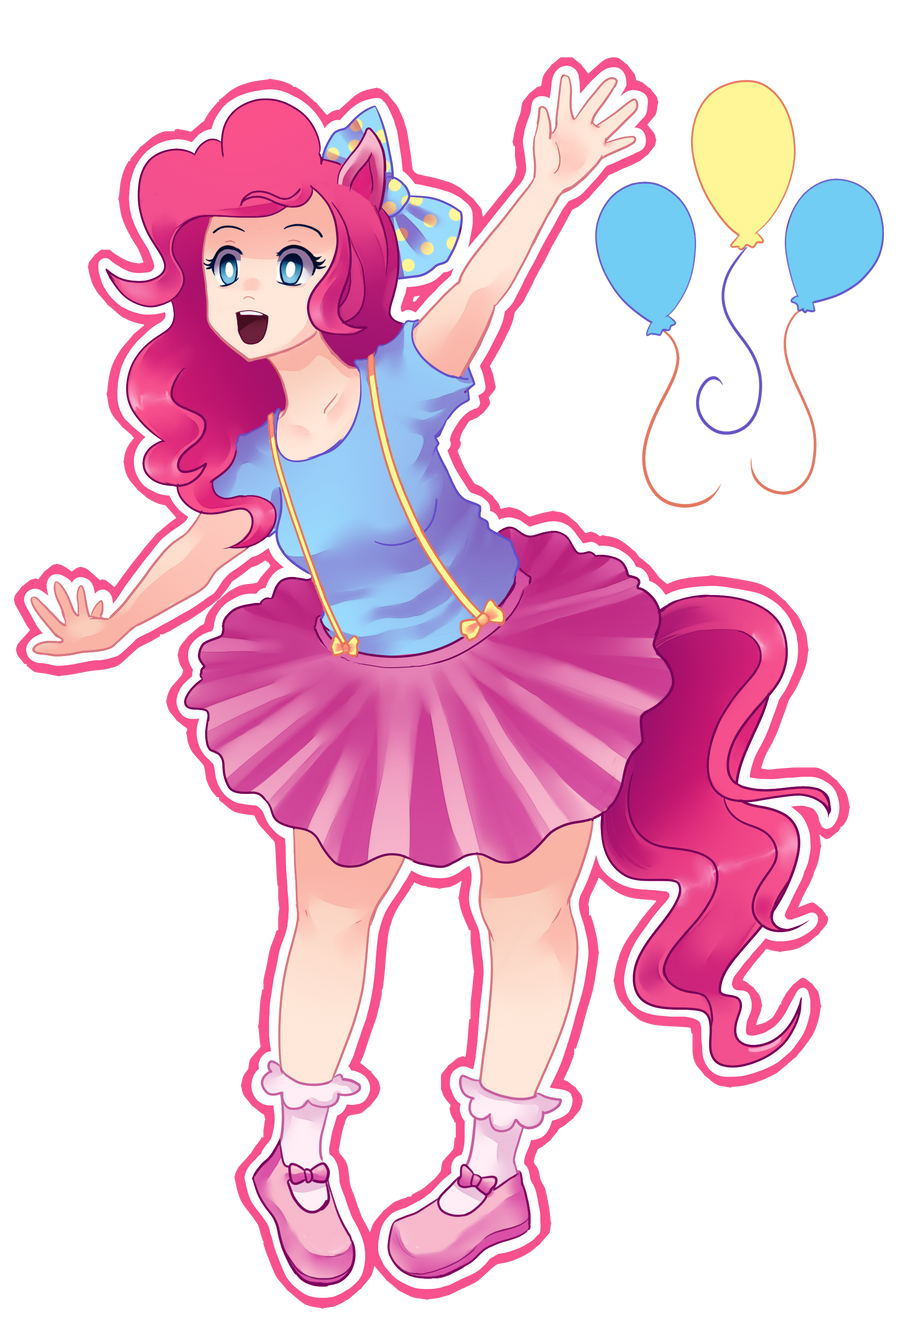 Pinkie Pie by nanidani